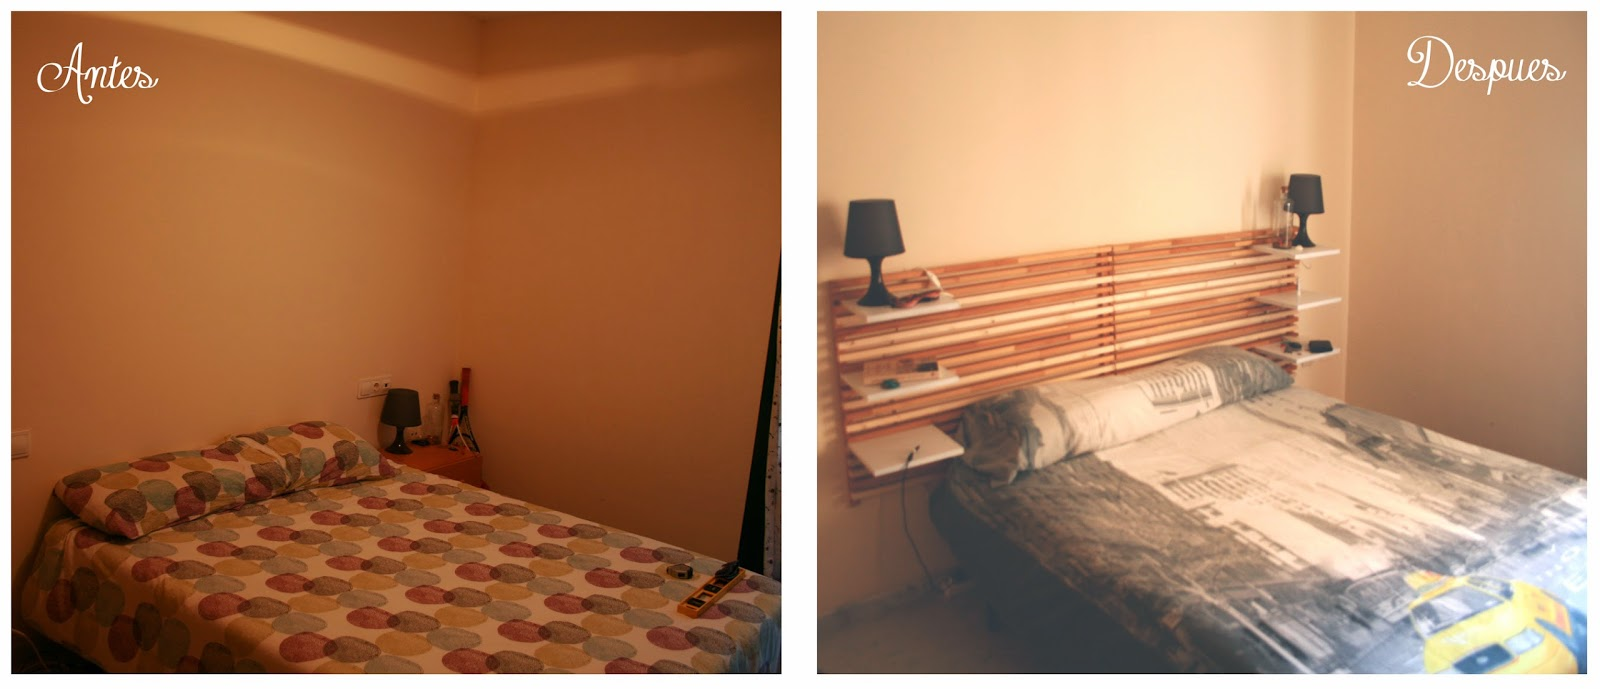 Cabecero cama de matrimonio reciclado diyambo blog for Como hacer una cama alta de madera